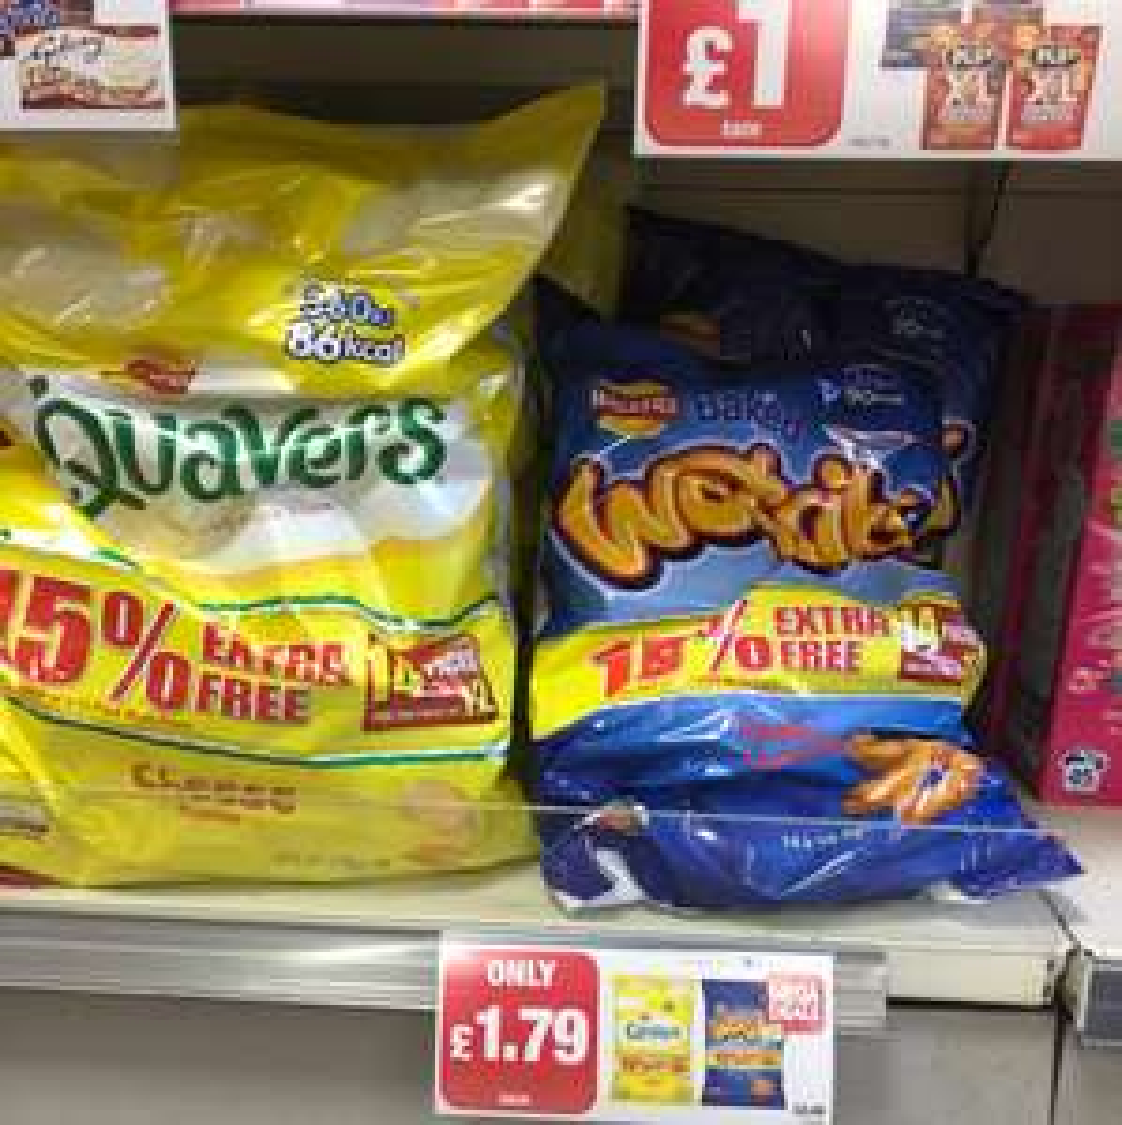 14 packs of Quavers/Wotsits about 12p bag - Premier for £1.79